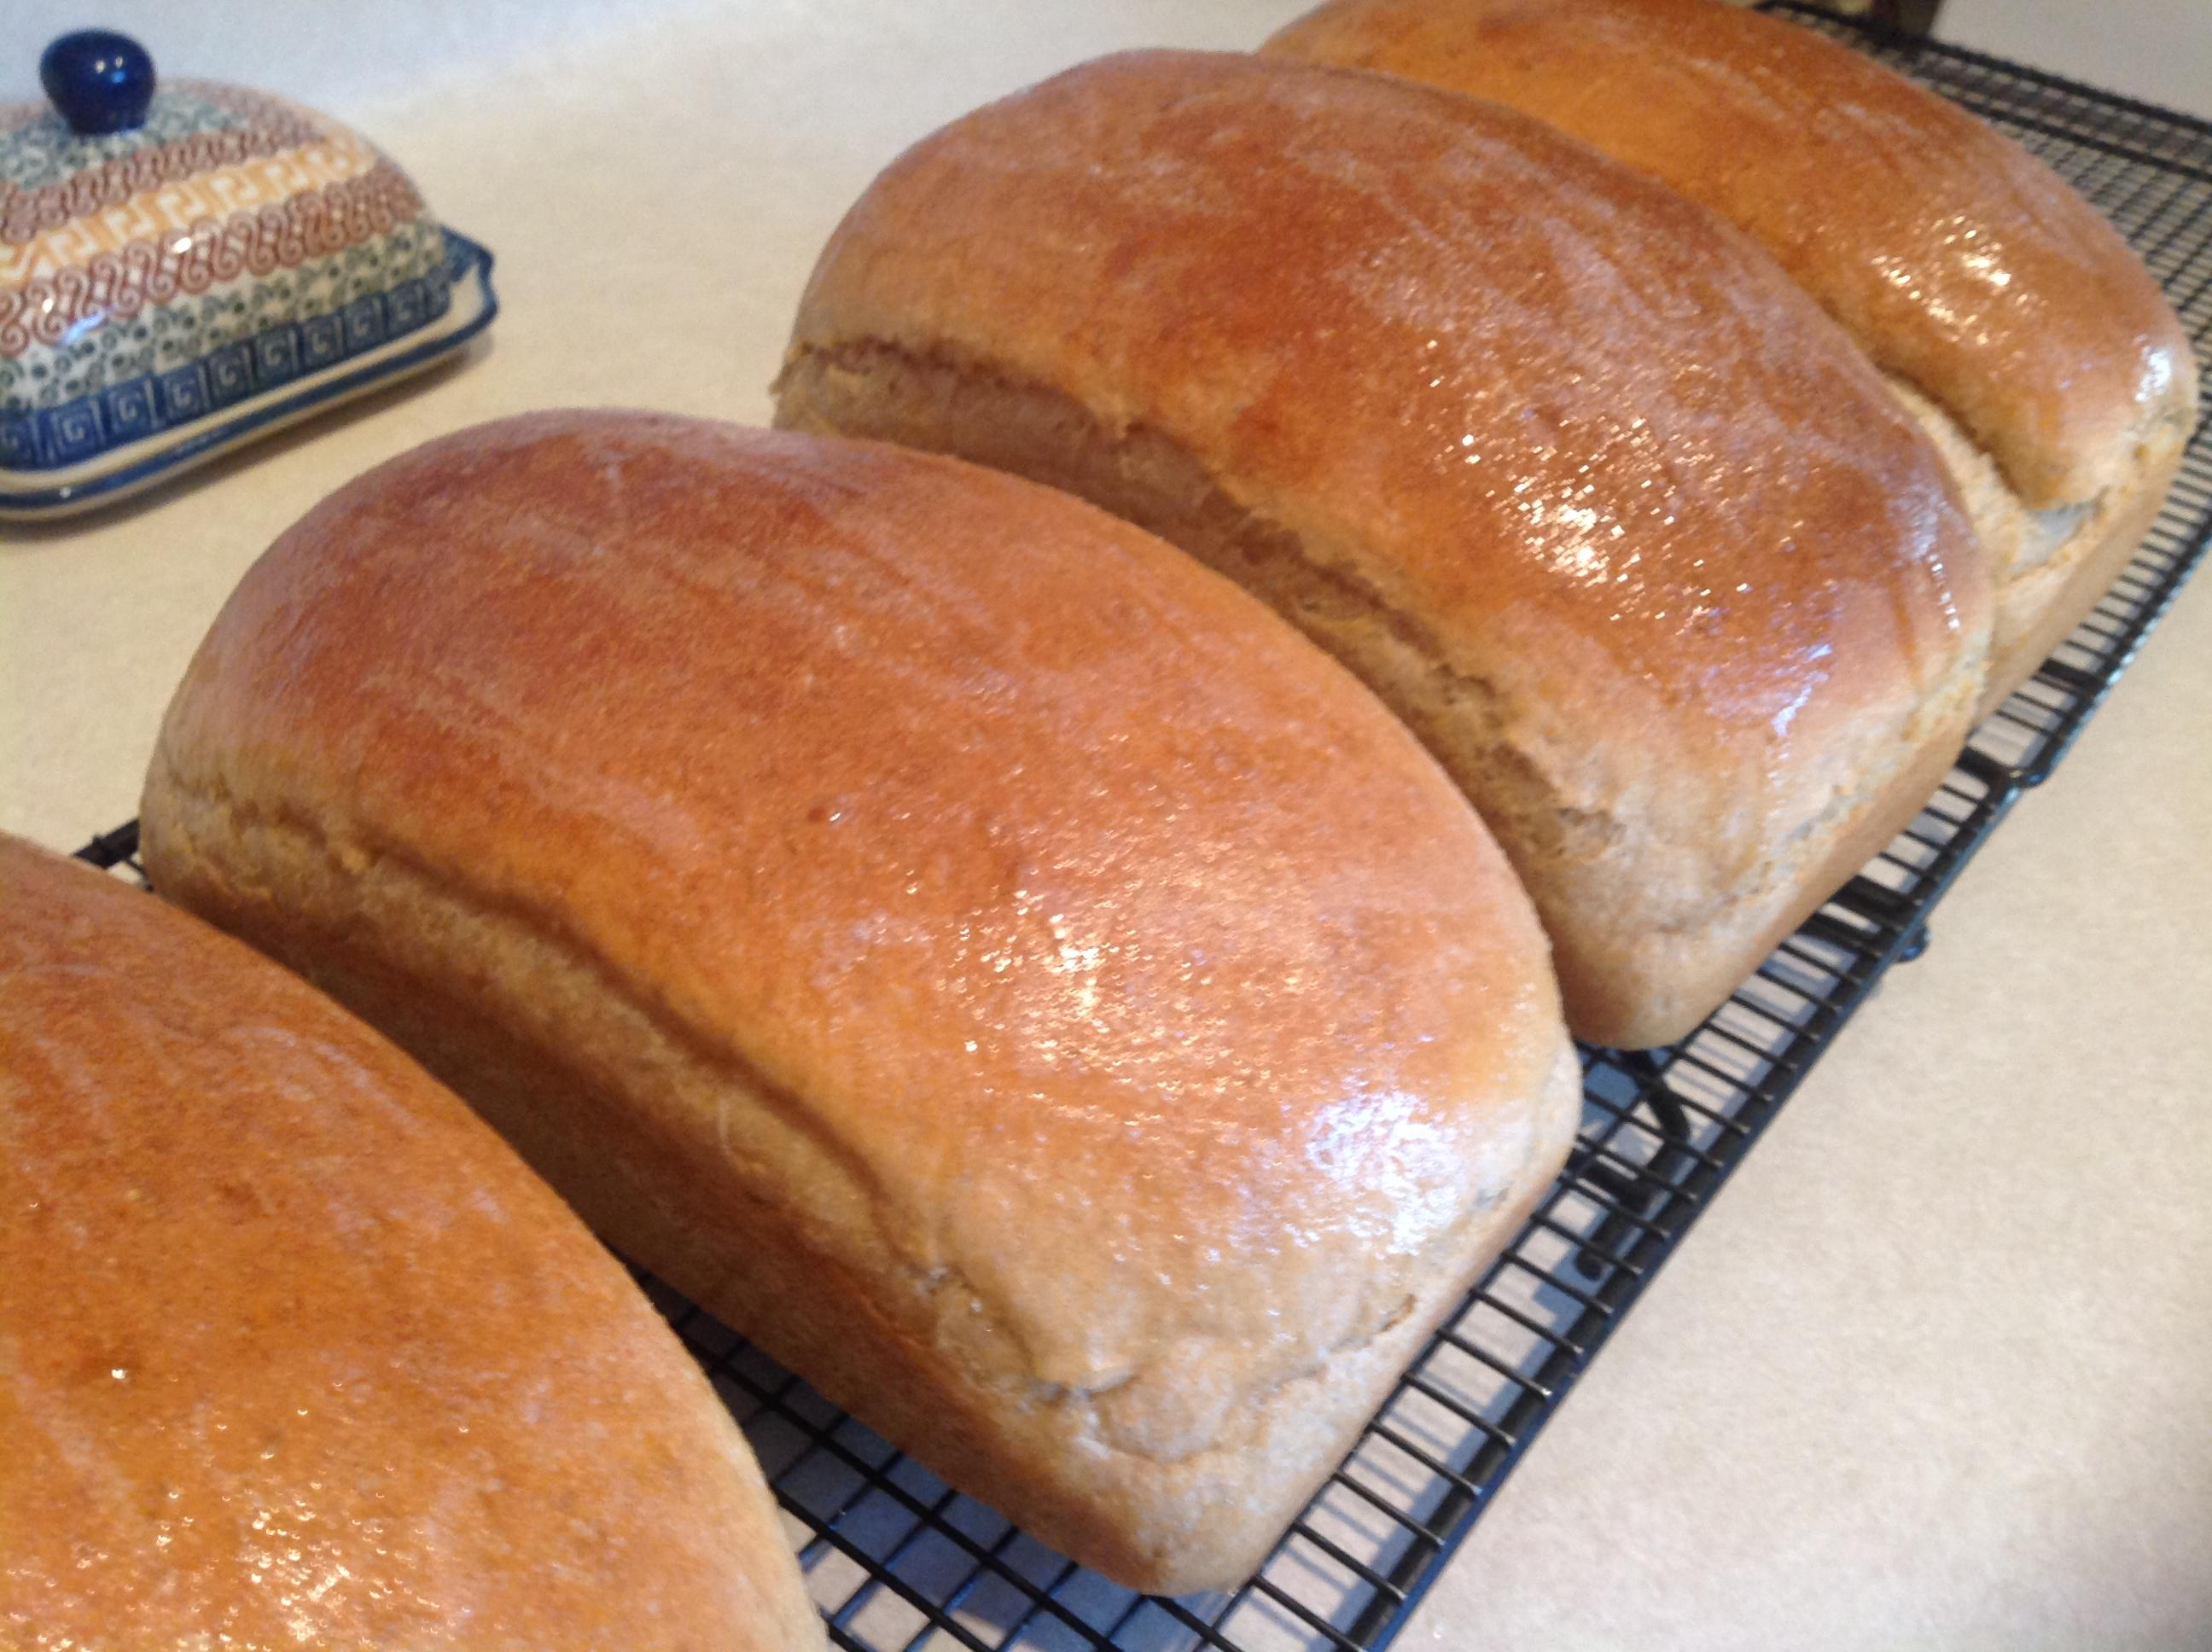 Homemade bread – mmmm